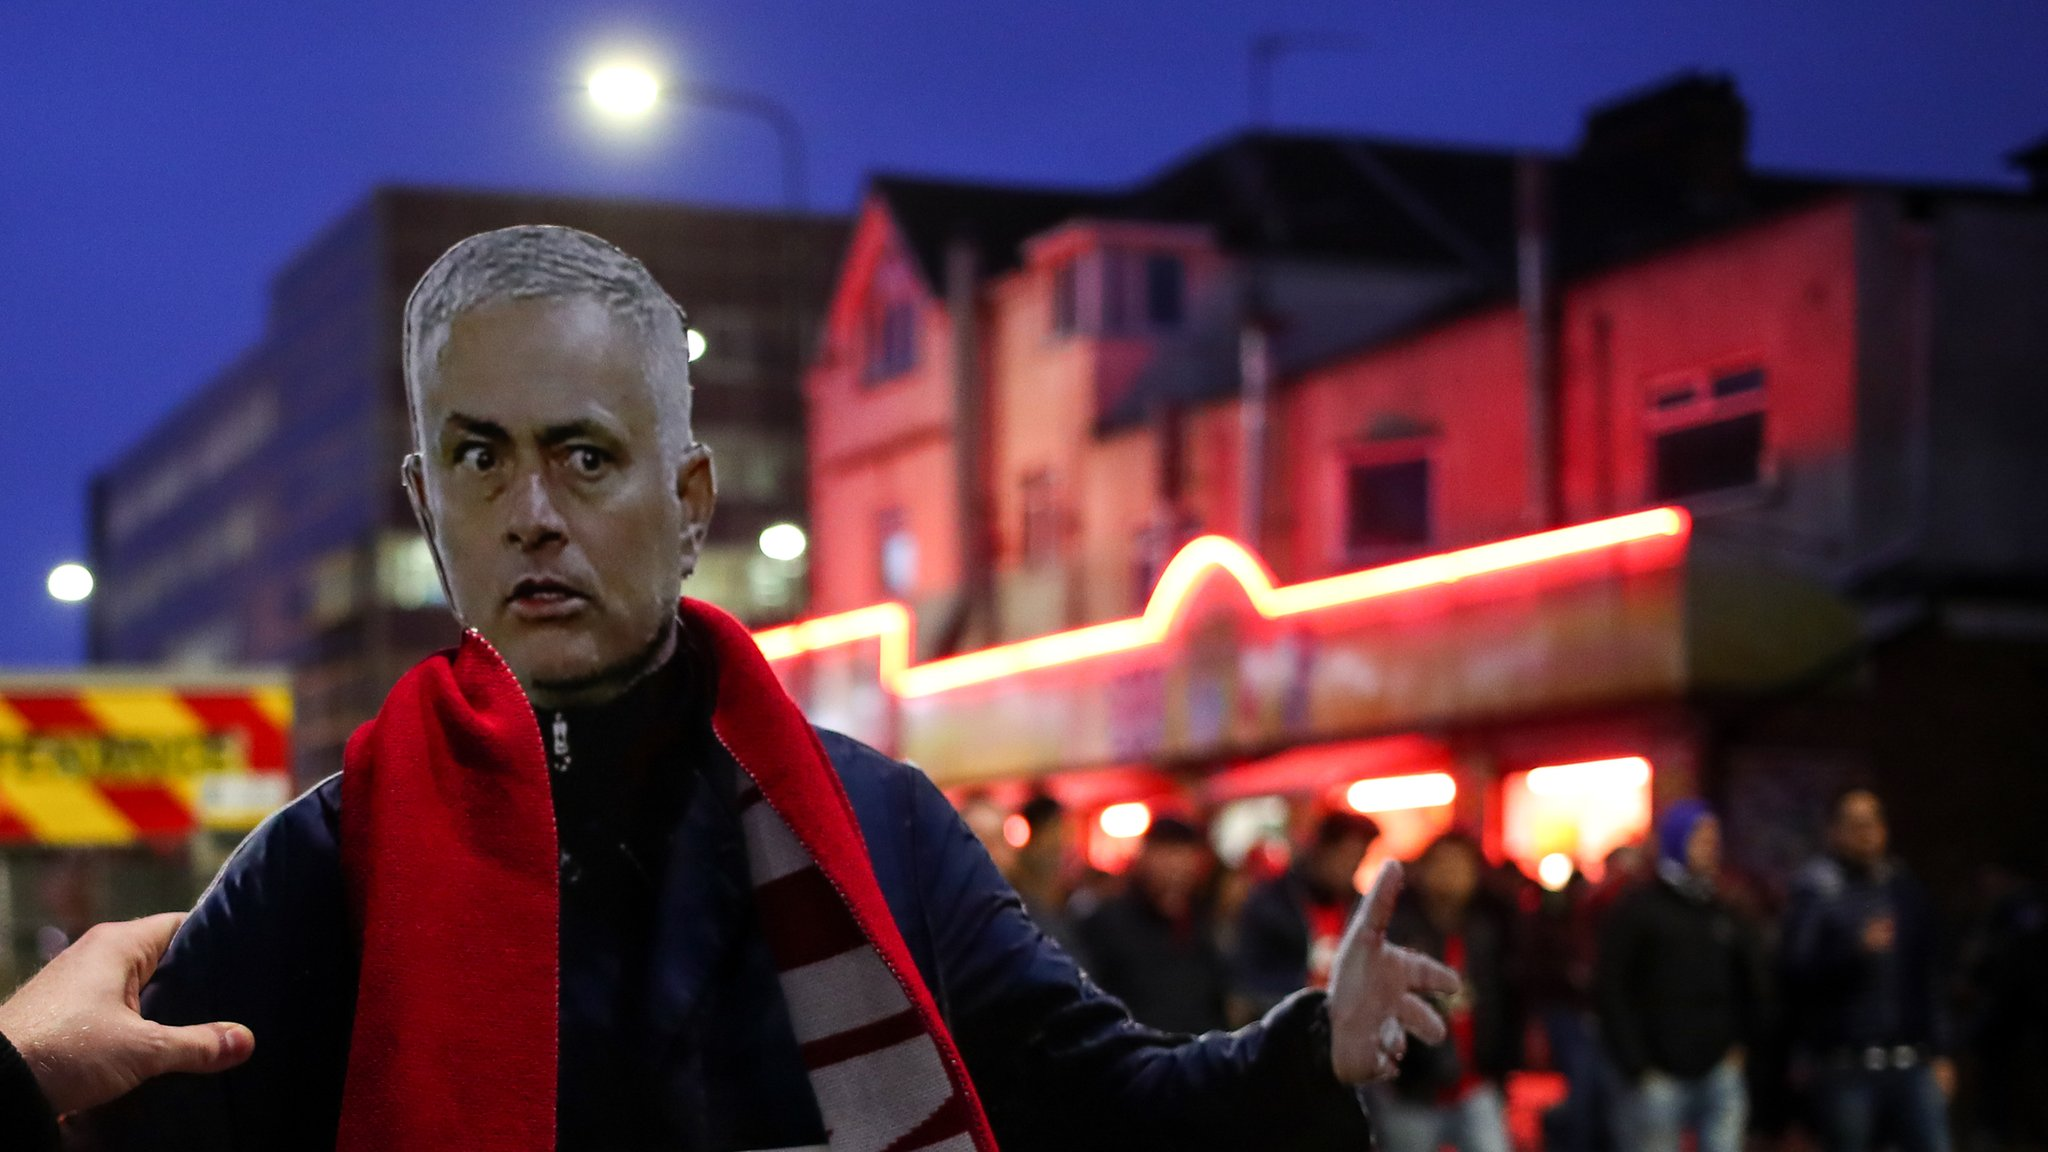 Mourinho walks to Old Trafford as Man Utd bus delayed again